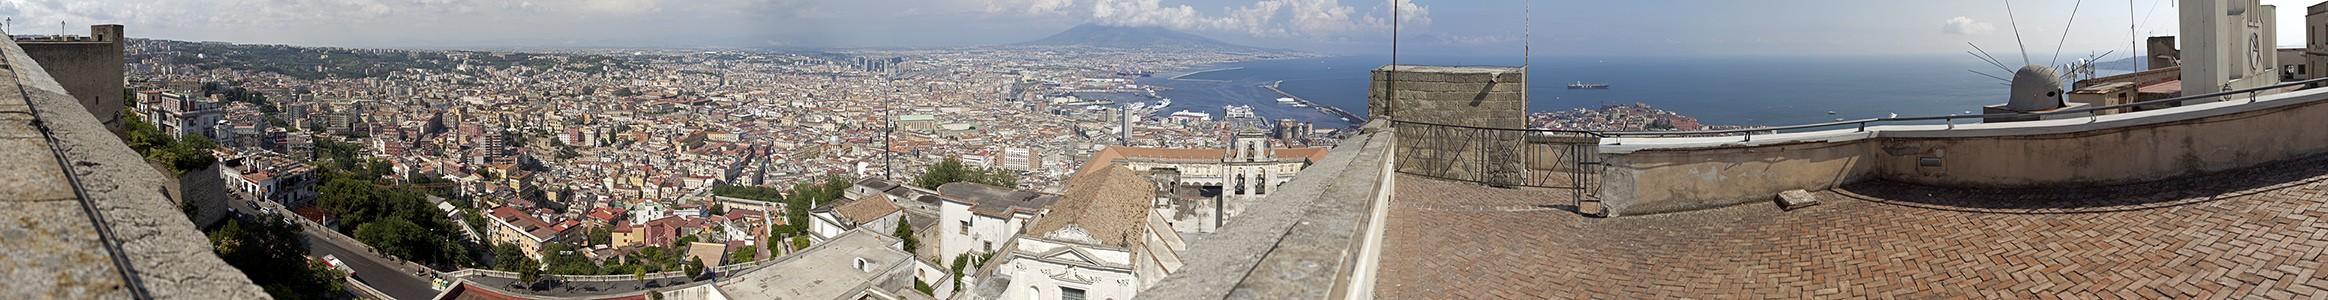 Blick vom Castel Sant' Elmo: Neapel, Vesuv, Golf von Neapel Neapel